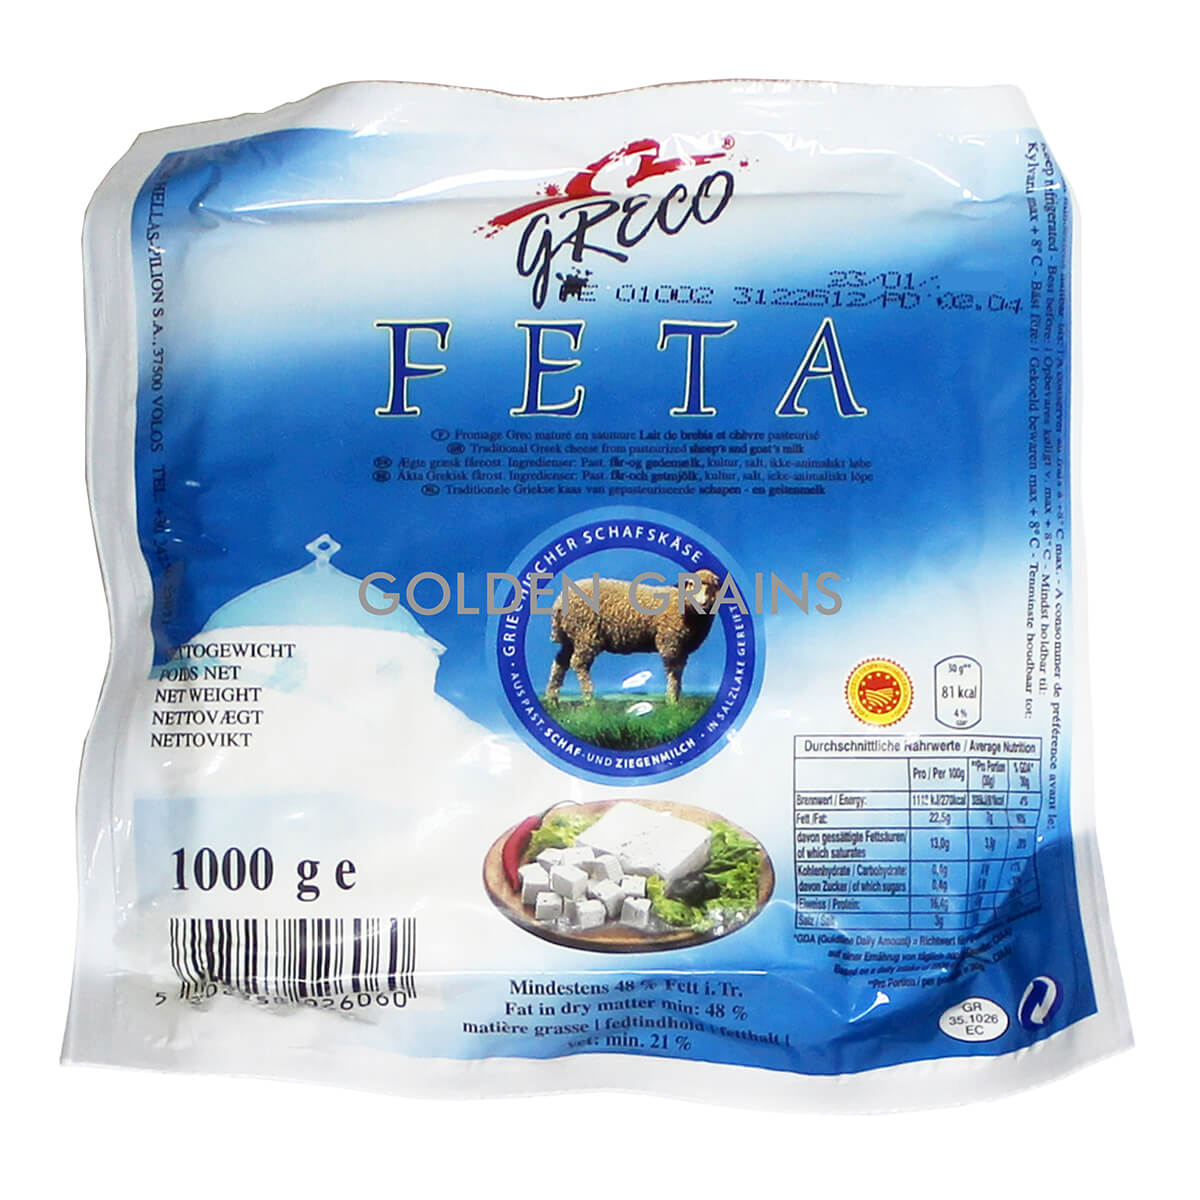 Greco Feta Cheese